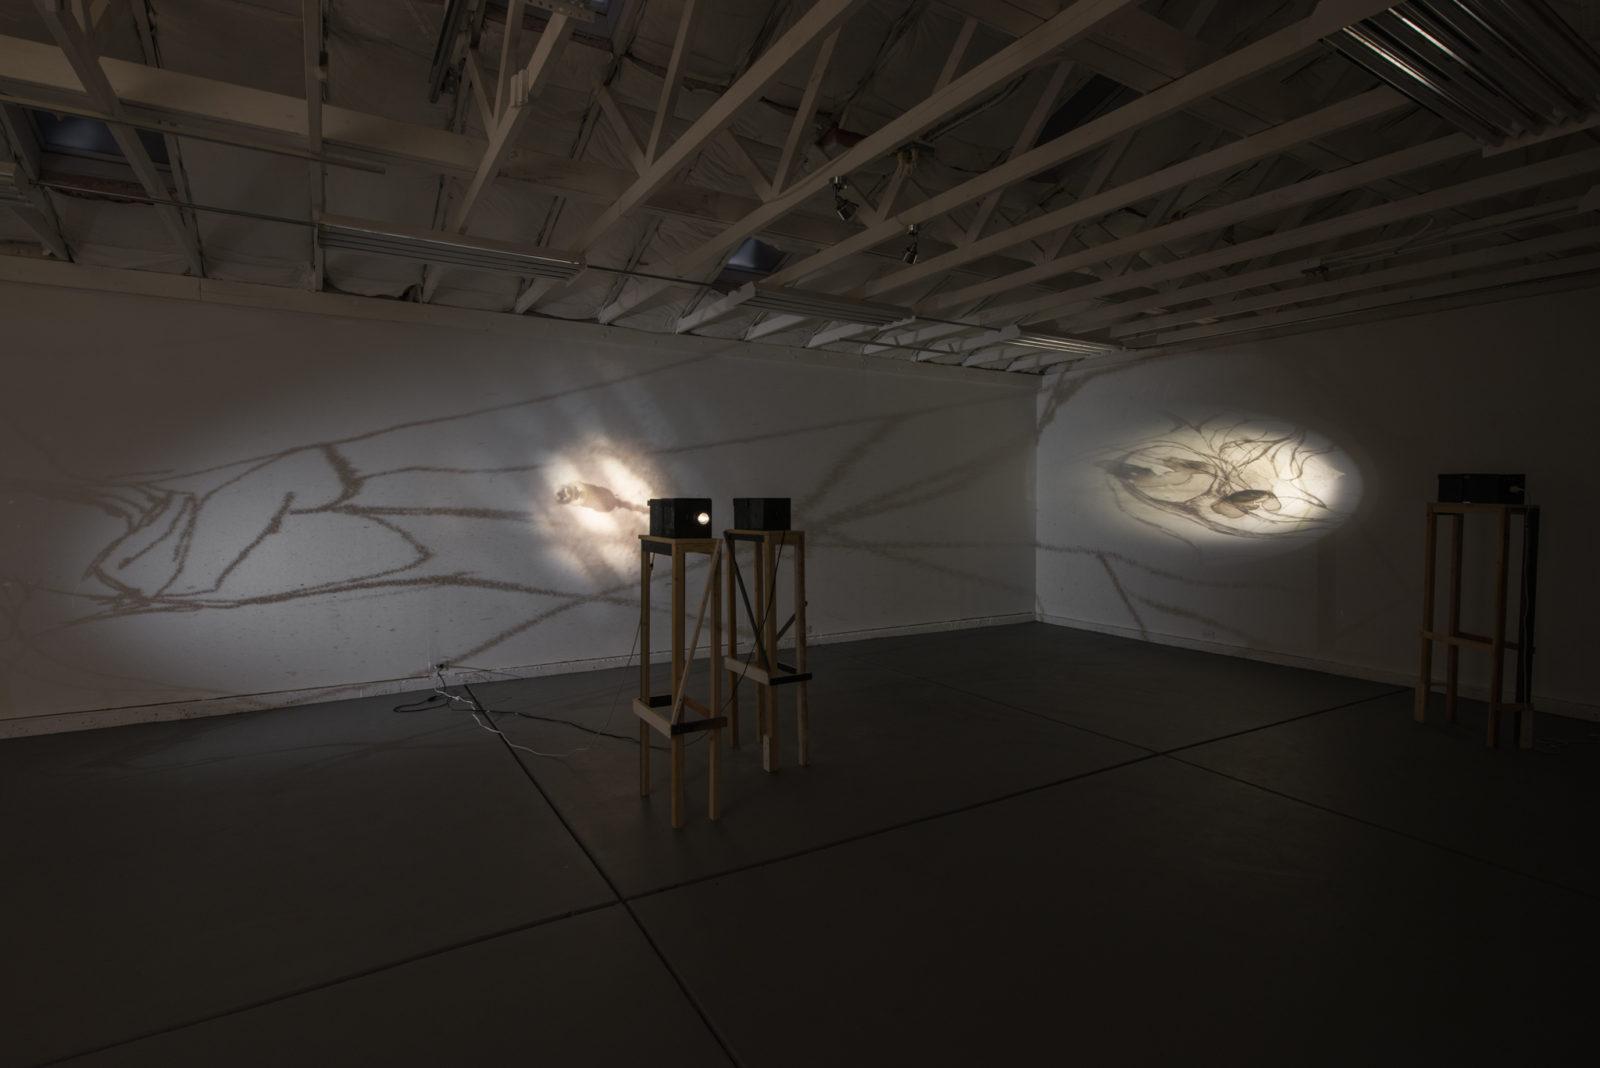 Komorebi (installation view), 2019